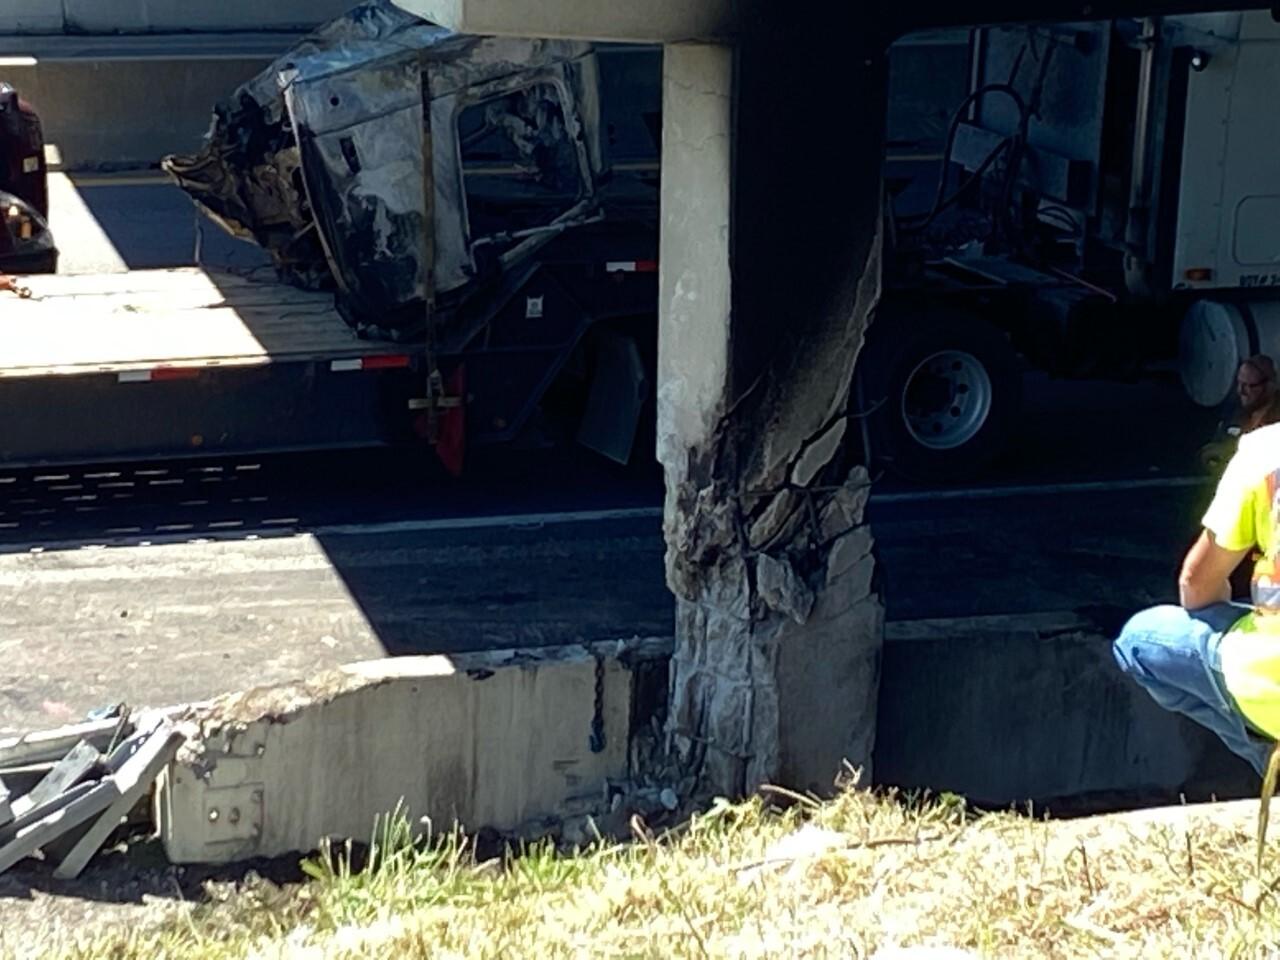 i-40 mt juliet road bridge damage